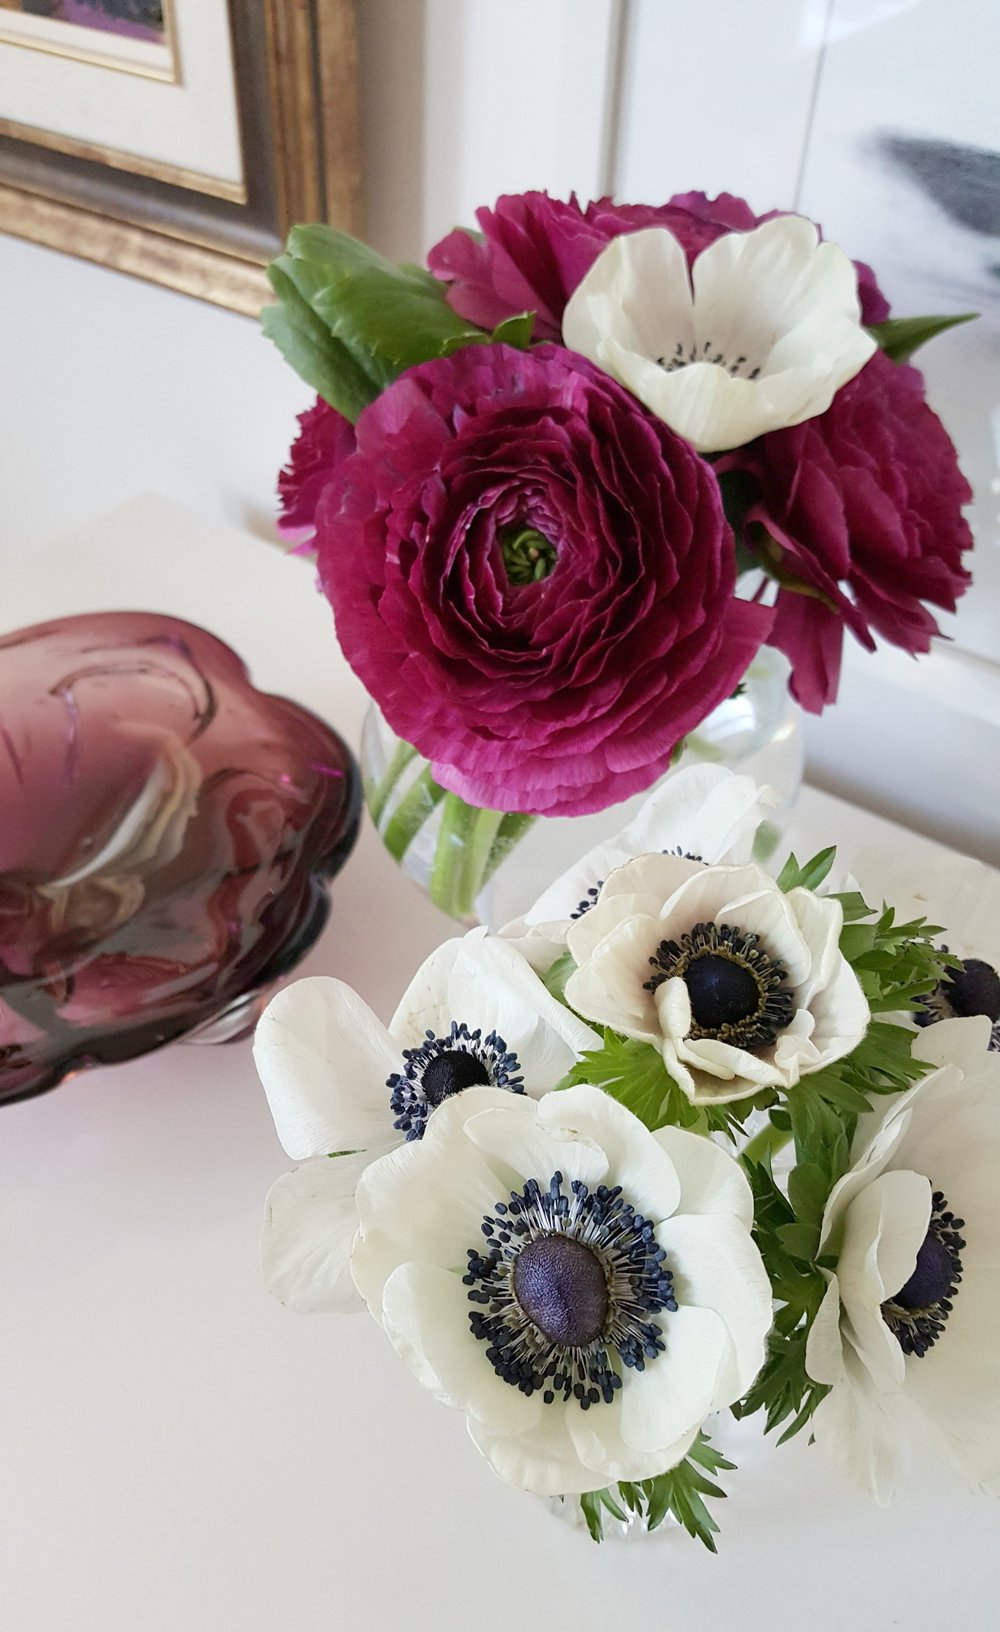 flowers up close.jpg